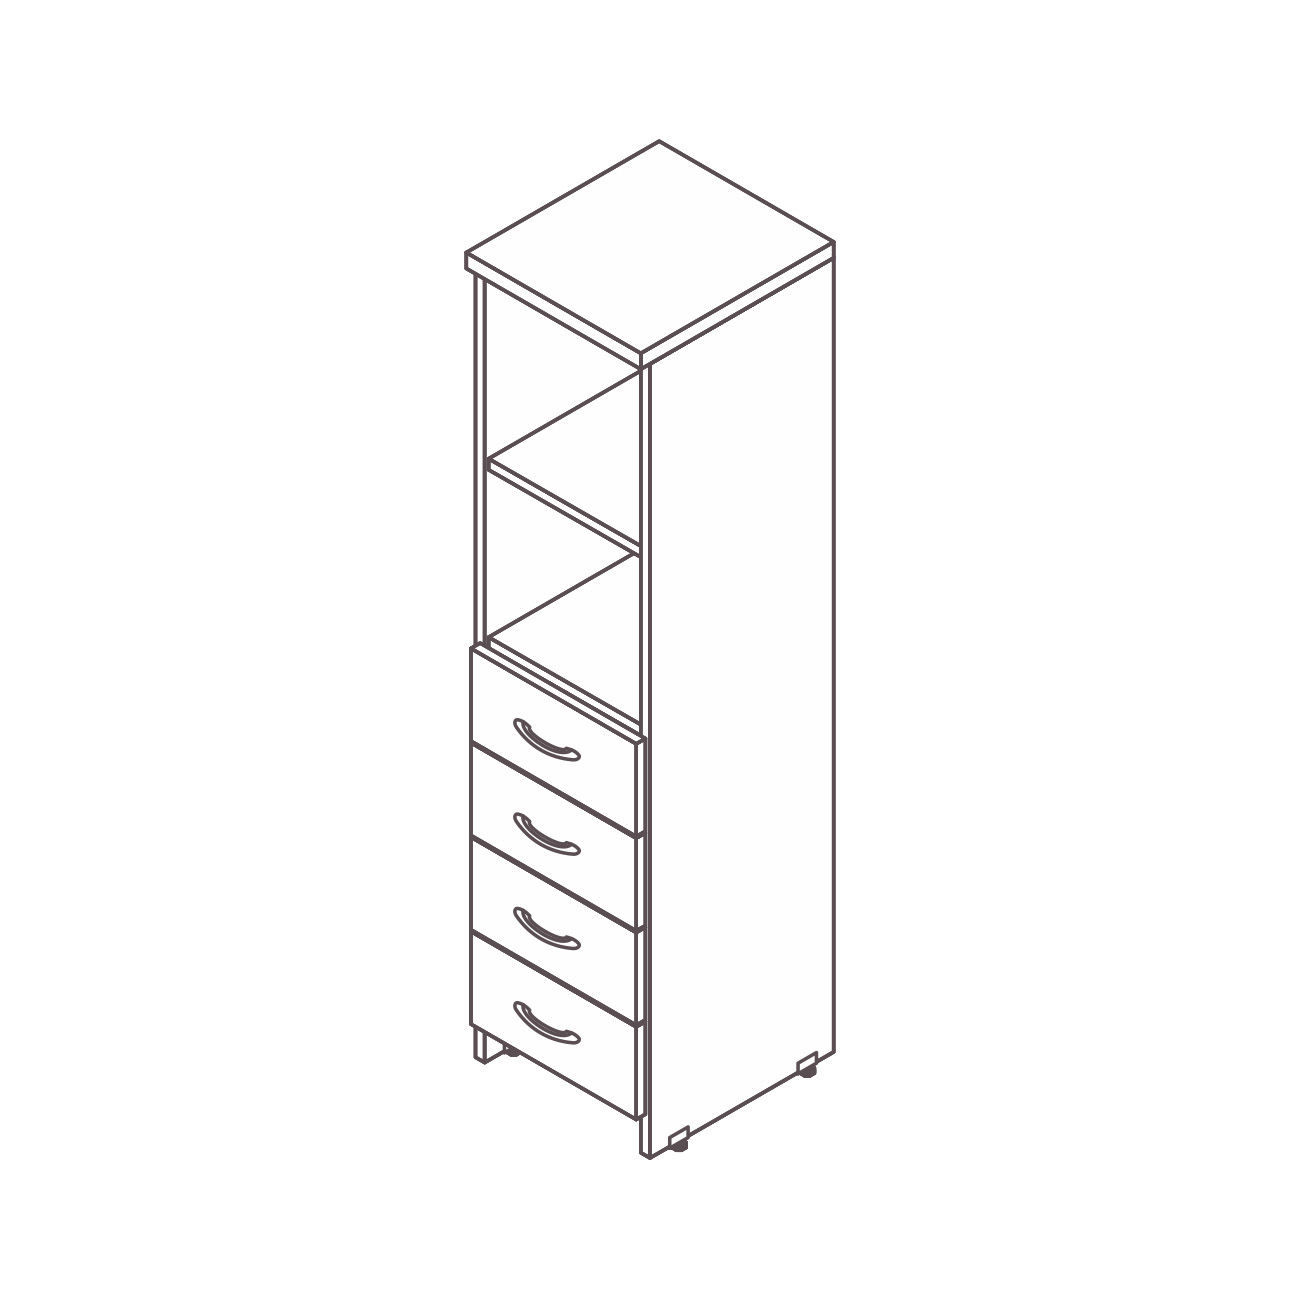 Armário estante 4 gavetas topázio